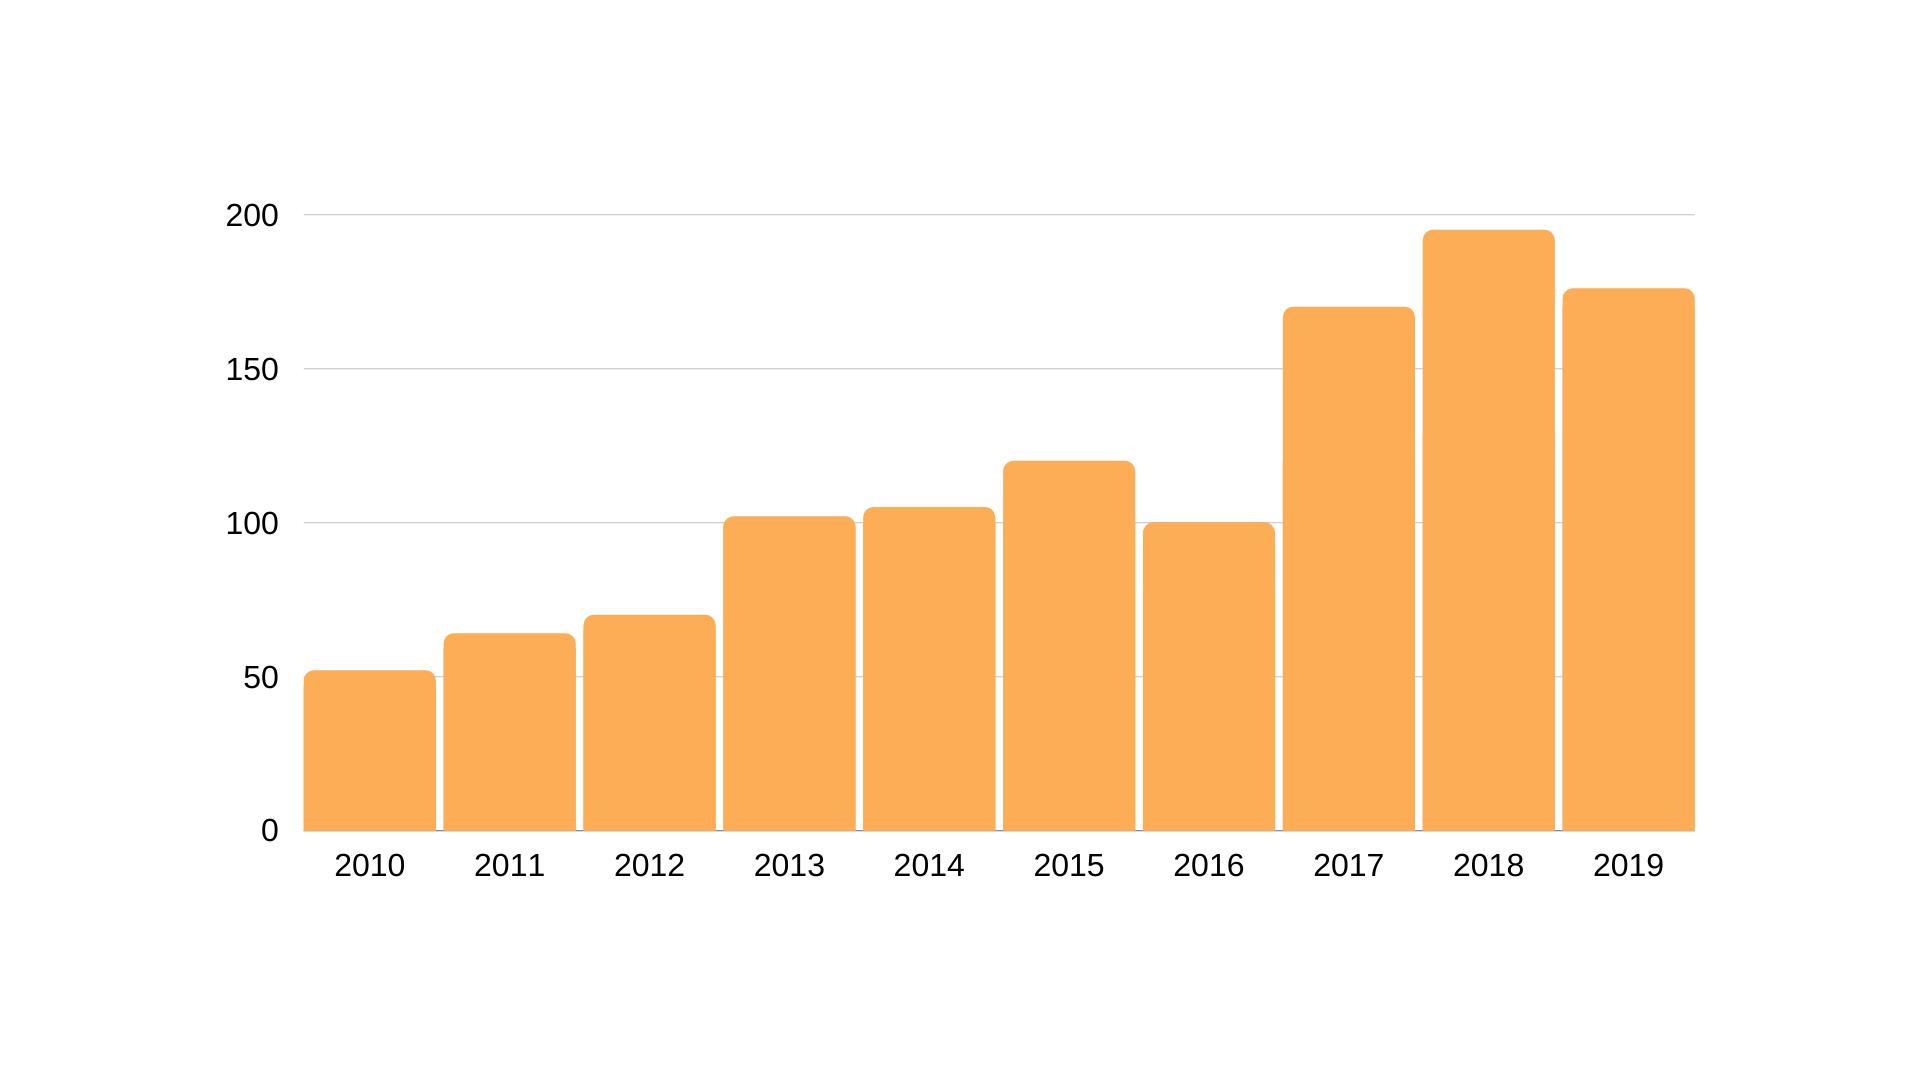 Bar graph of program enrollment from 2010 to 2019, trending upward